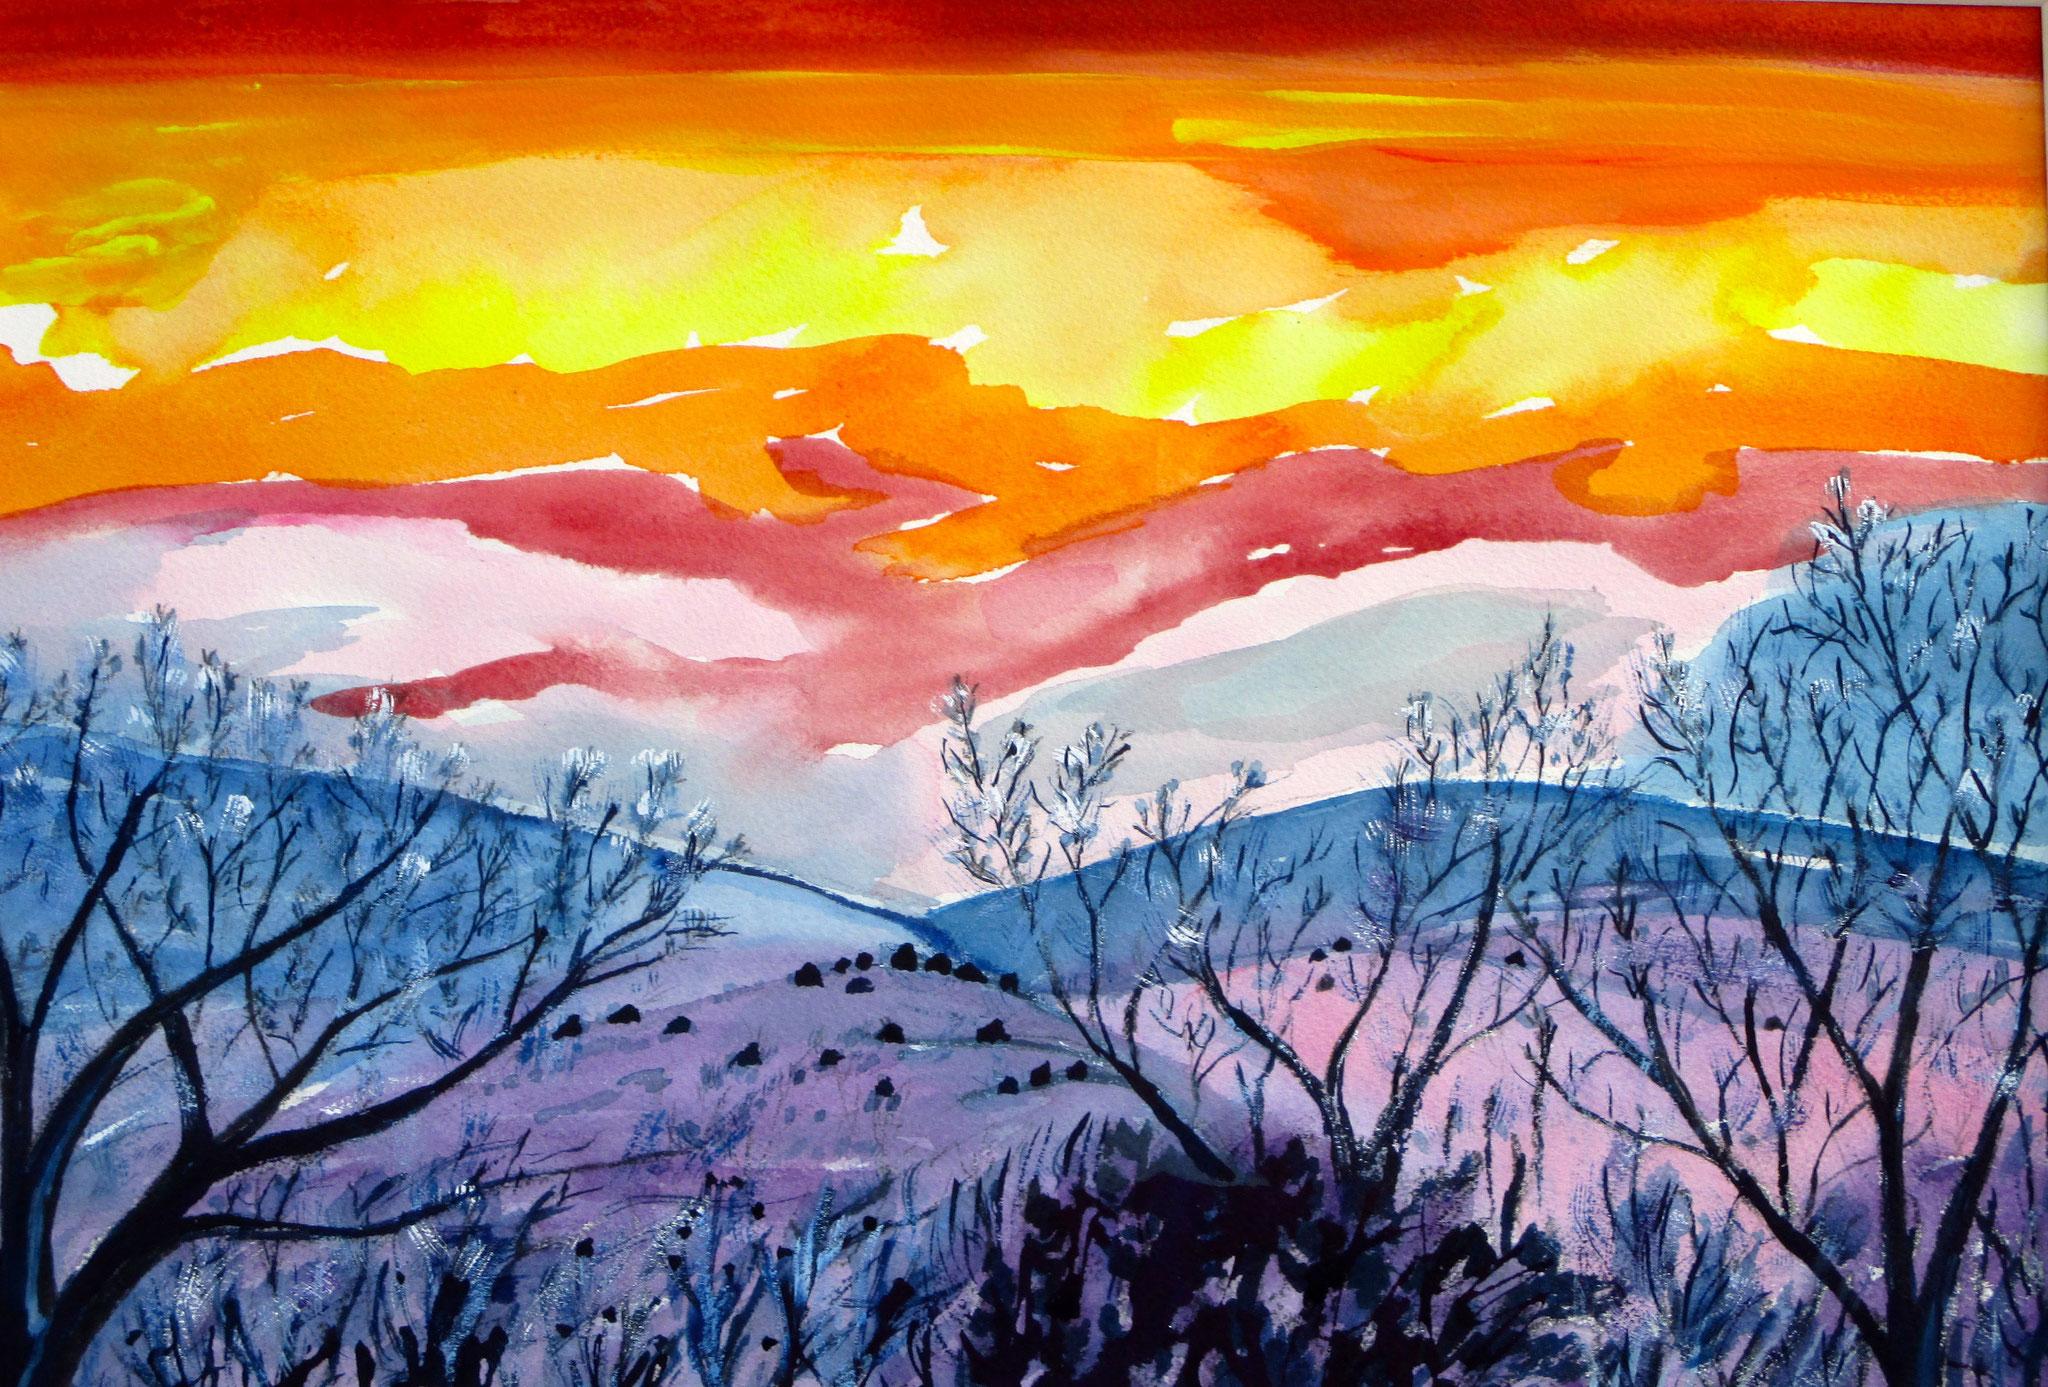 Santa Fe Sunset, watercolor, 24 x 18, SOLD